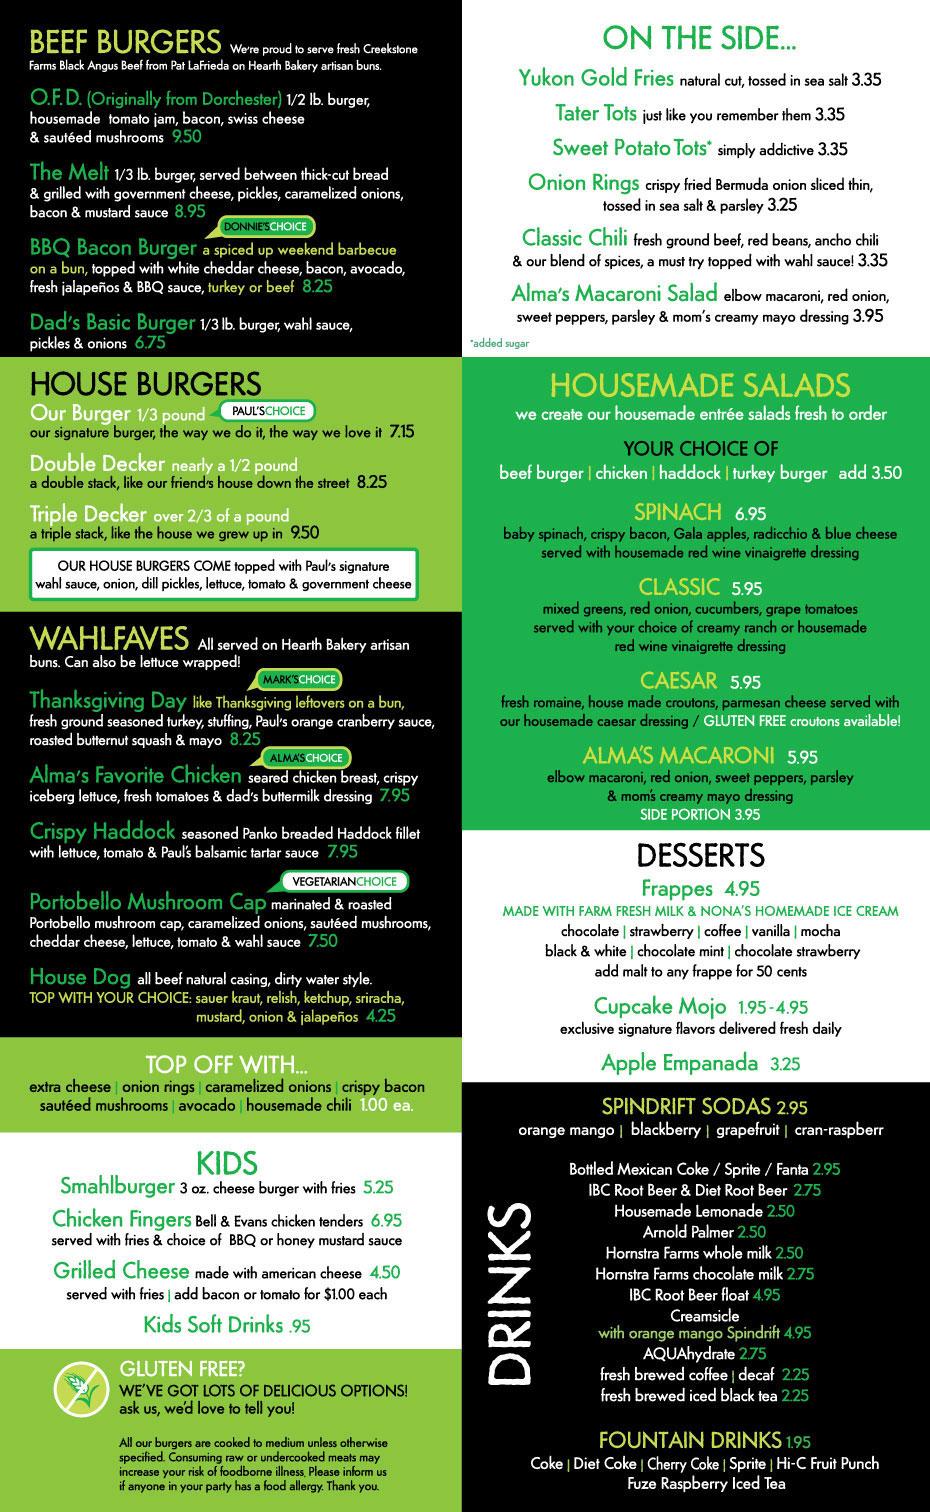 Surf Burgers >> Wahlburgers Rooftop Bar and Food Menu